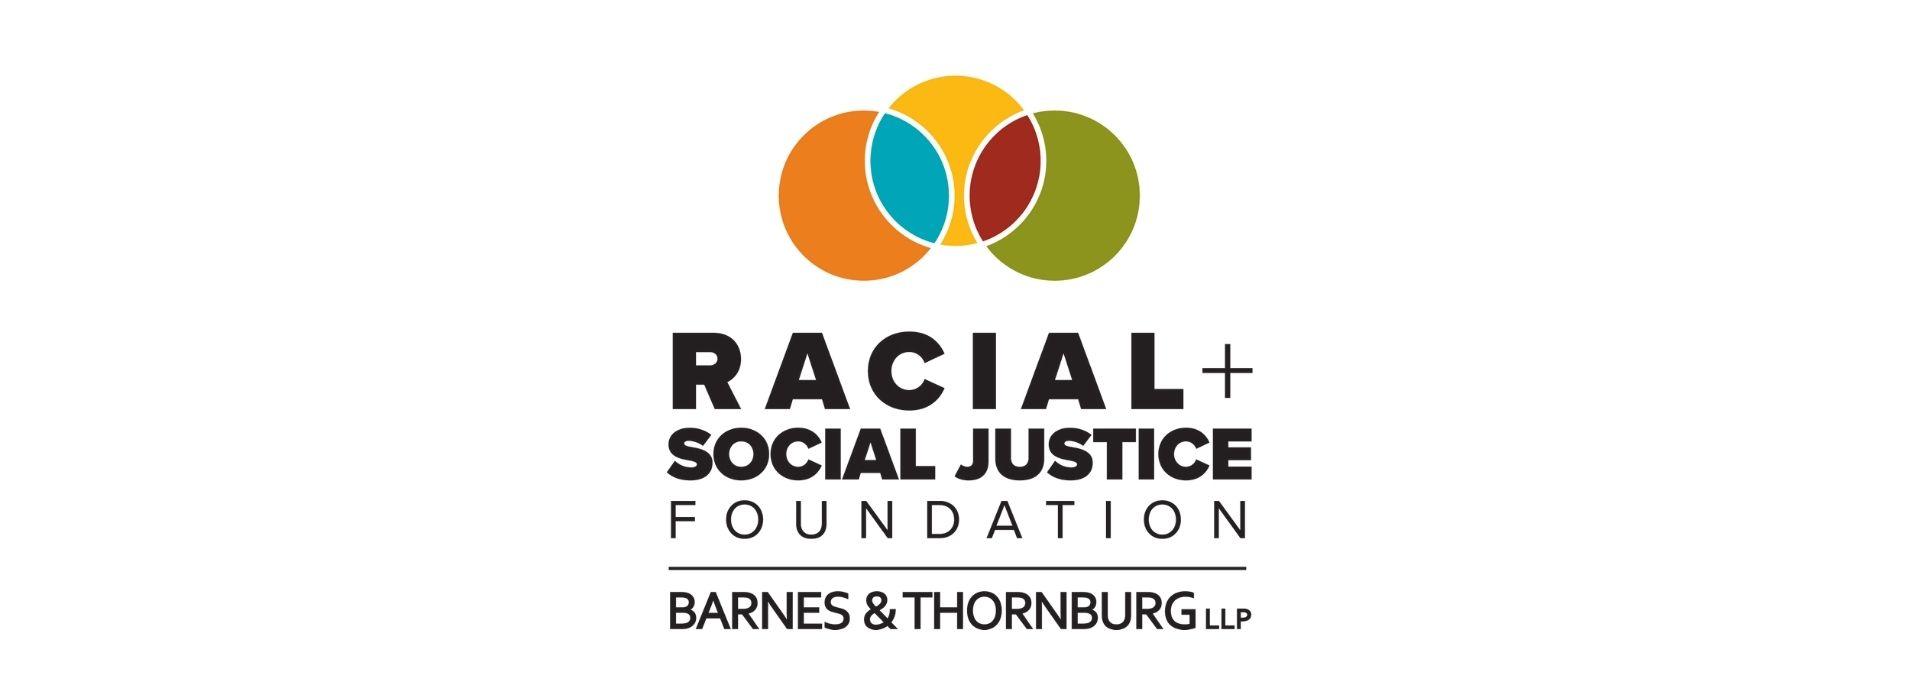 Barnes Thornburg Racial And Social Justice Foundation